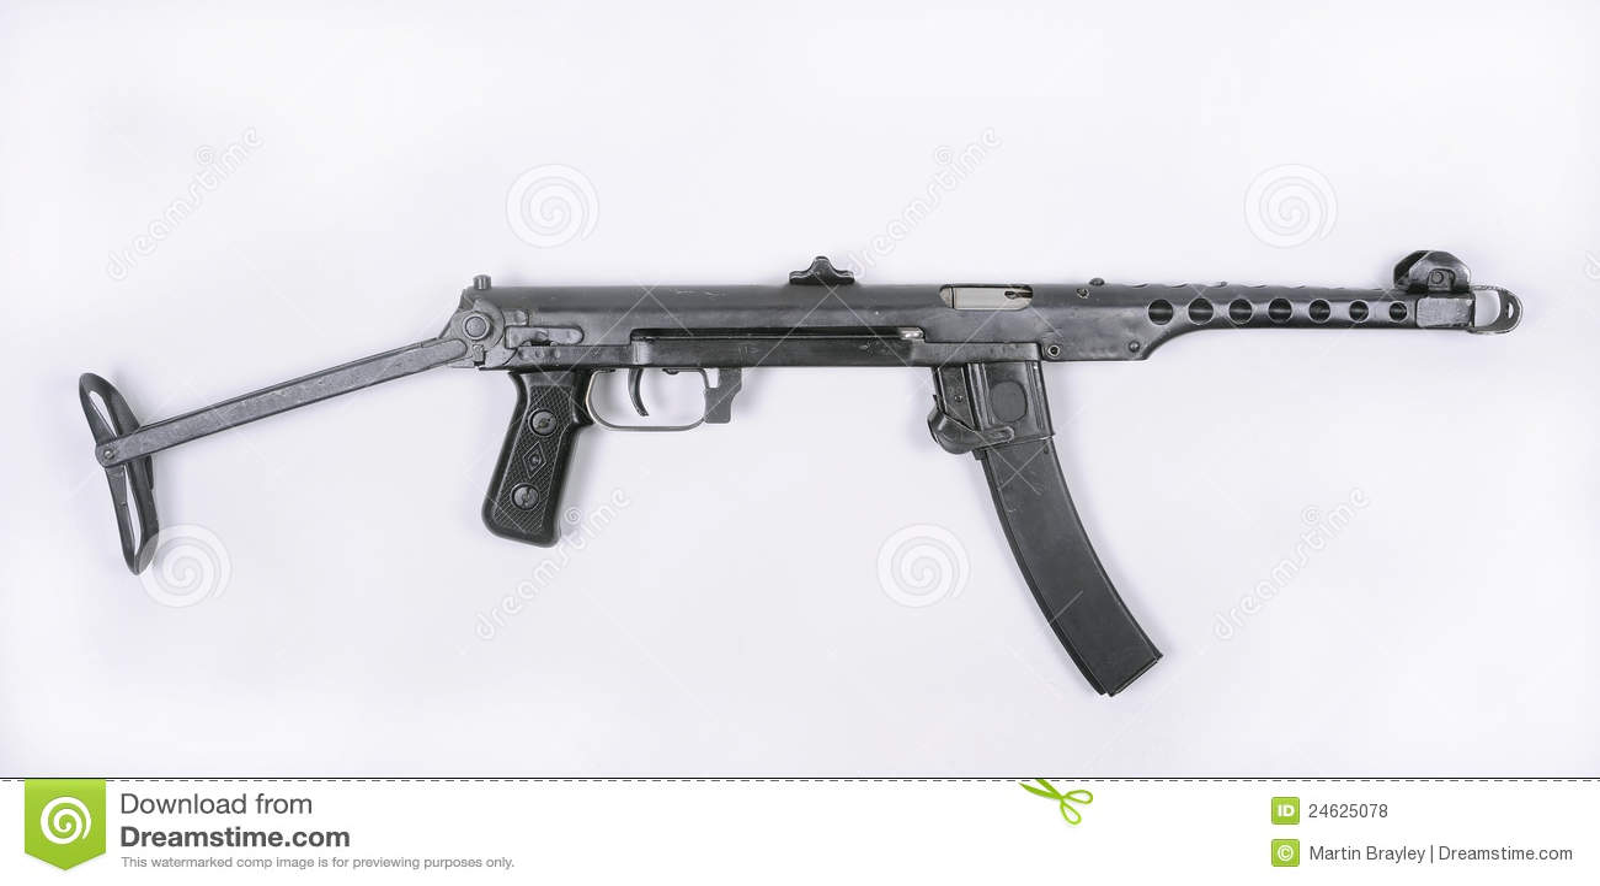 real machine guns